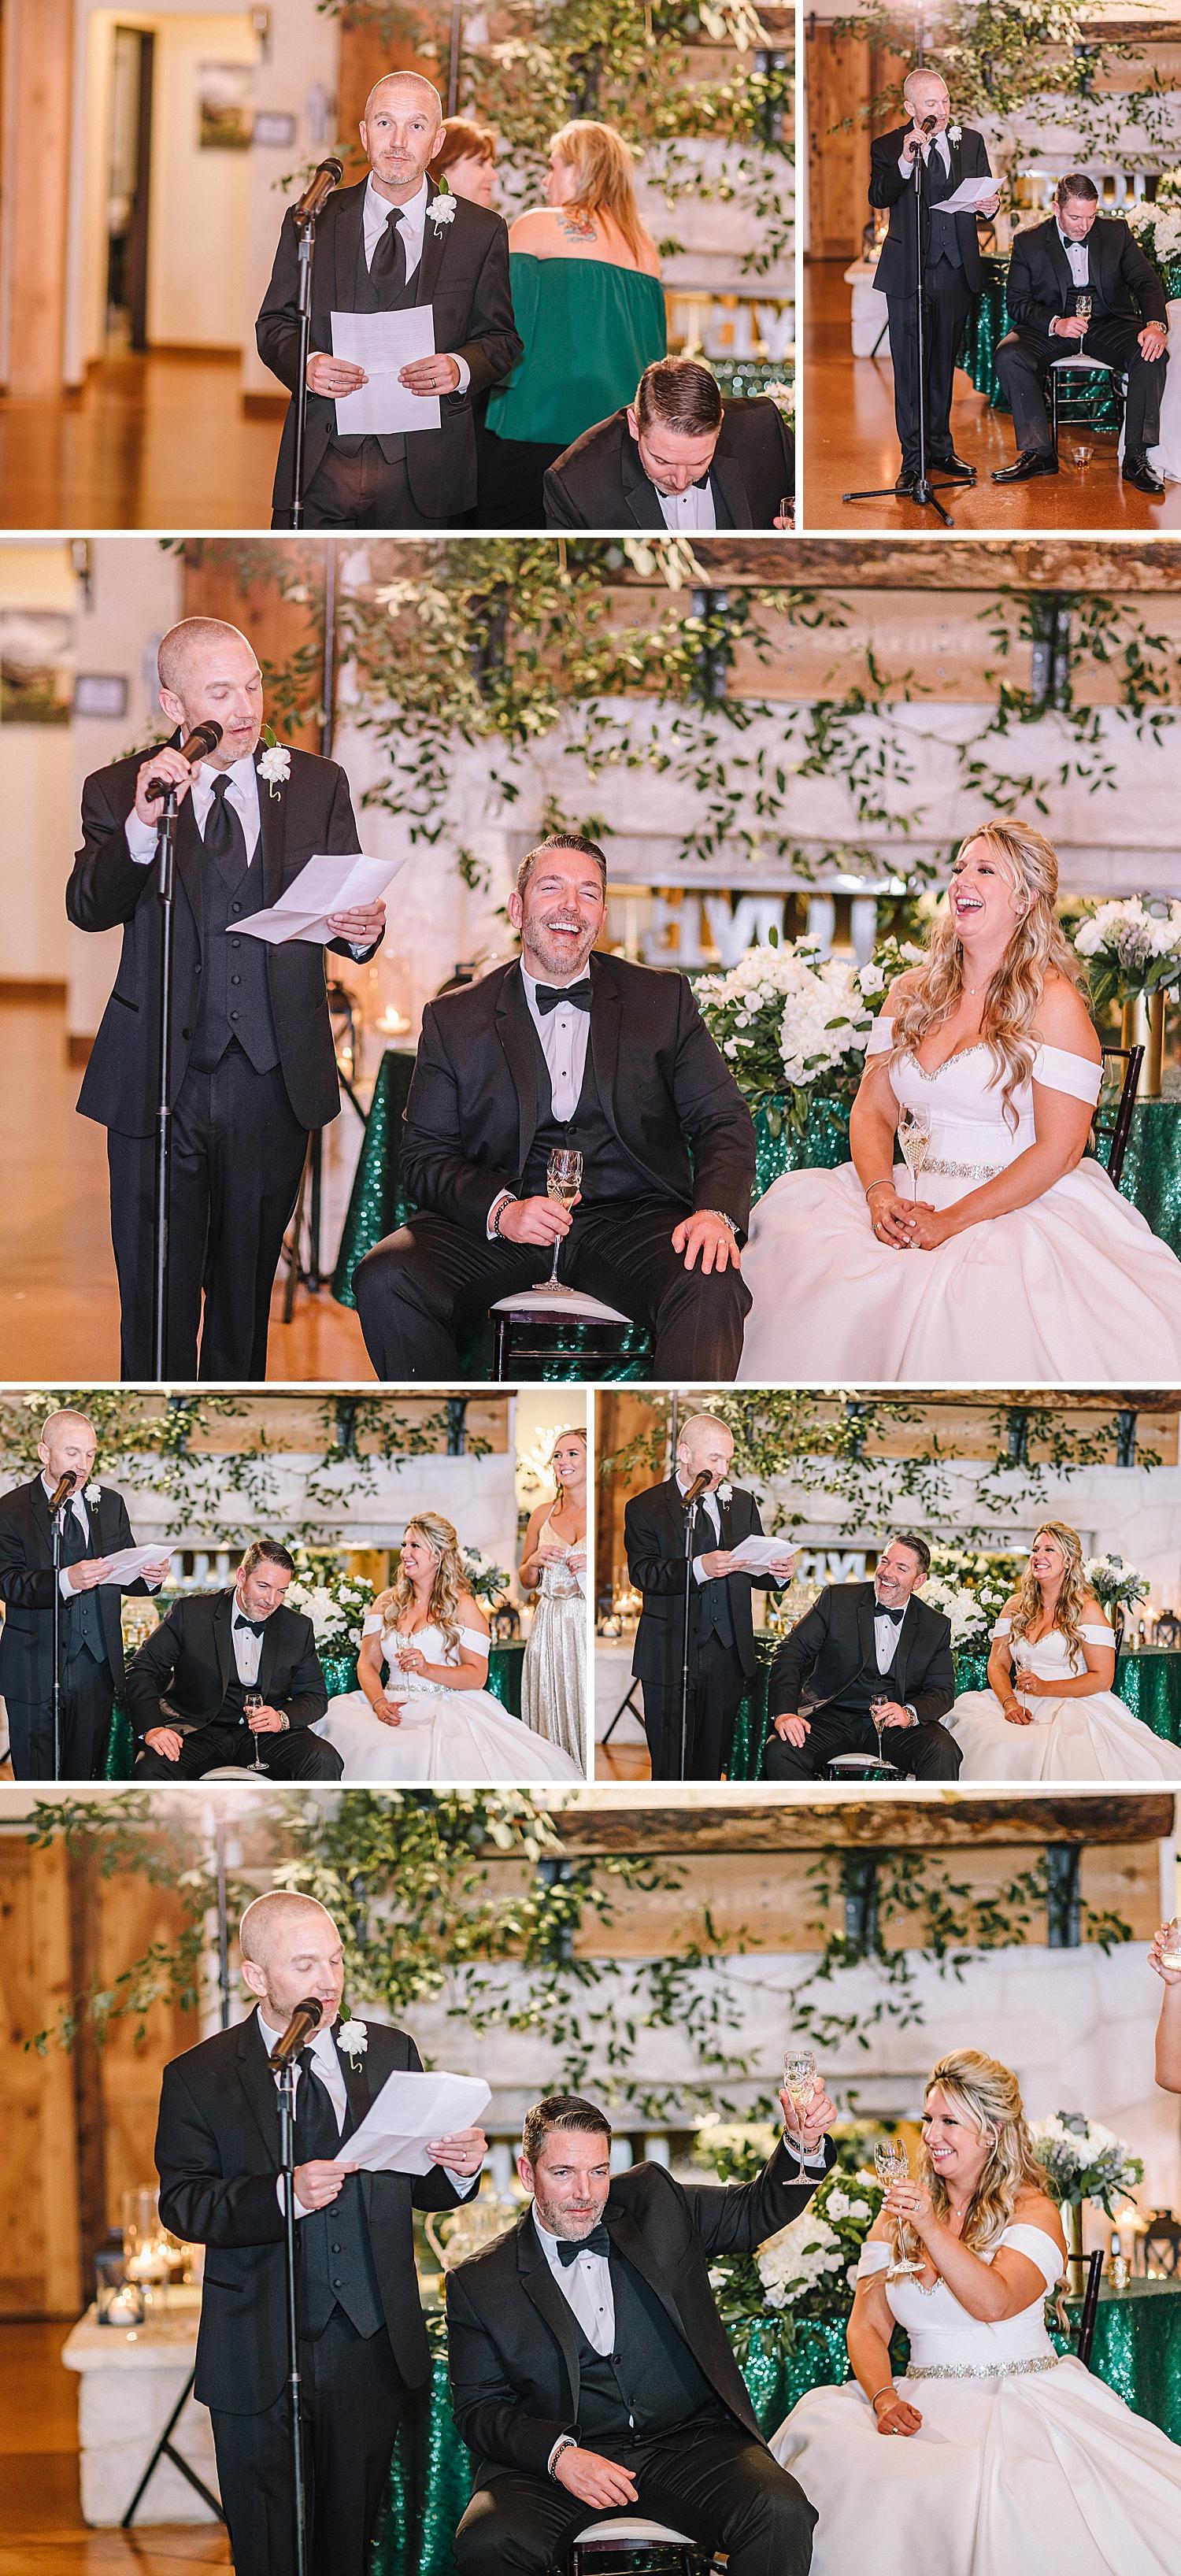 Magnolia-Halle-Wedding-San-Antonio-Texas-Bride-Grom_0097.jpg